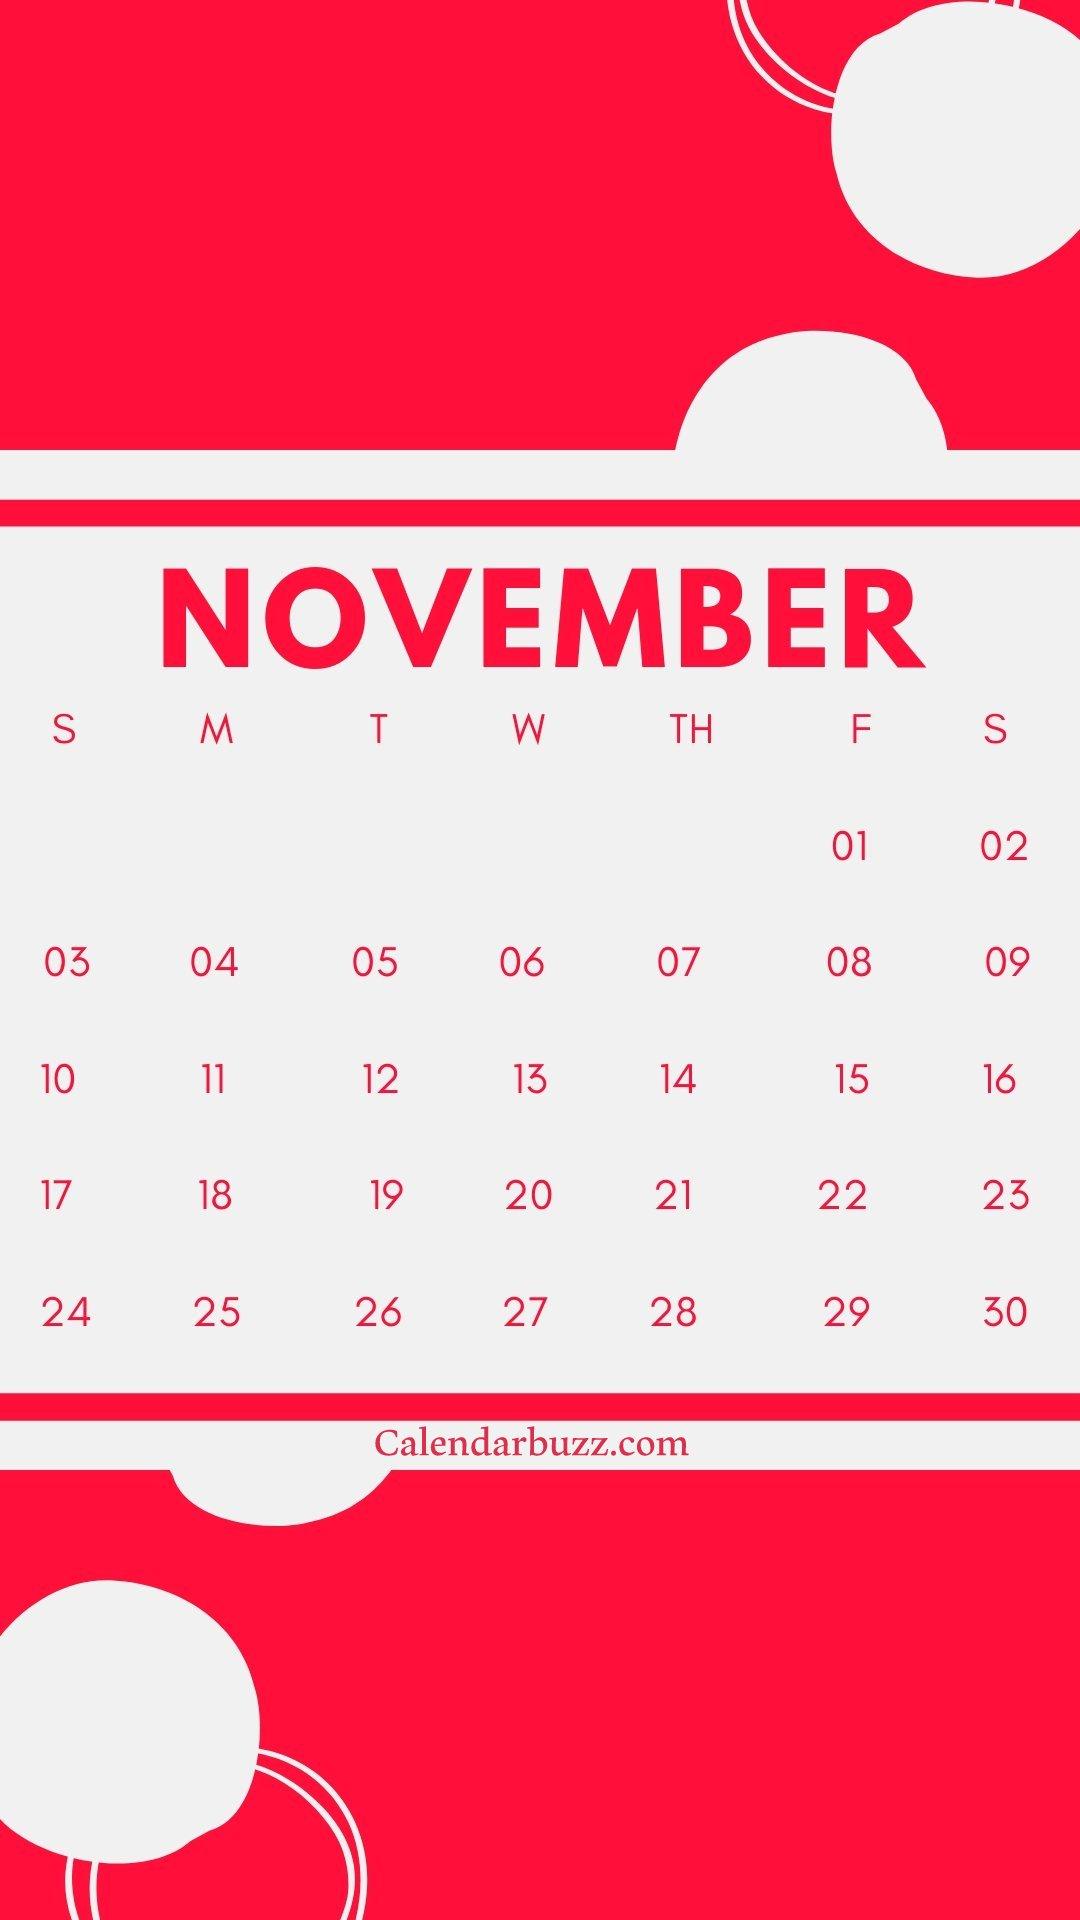 November 2019 iPhone Calendar Wallpaper